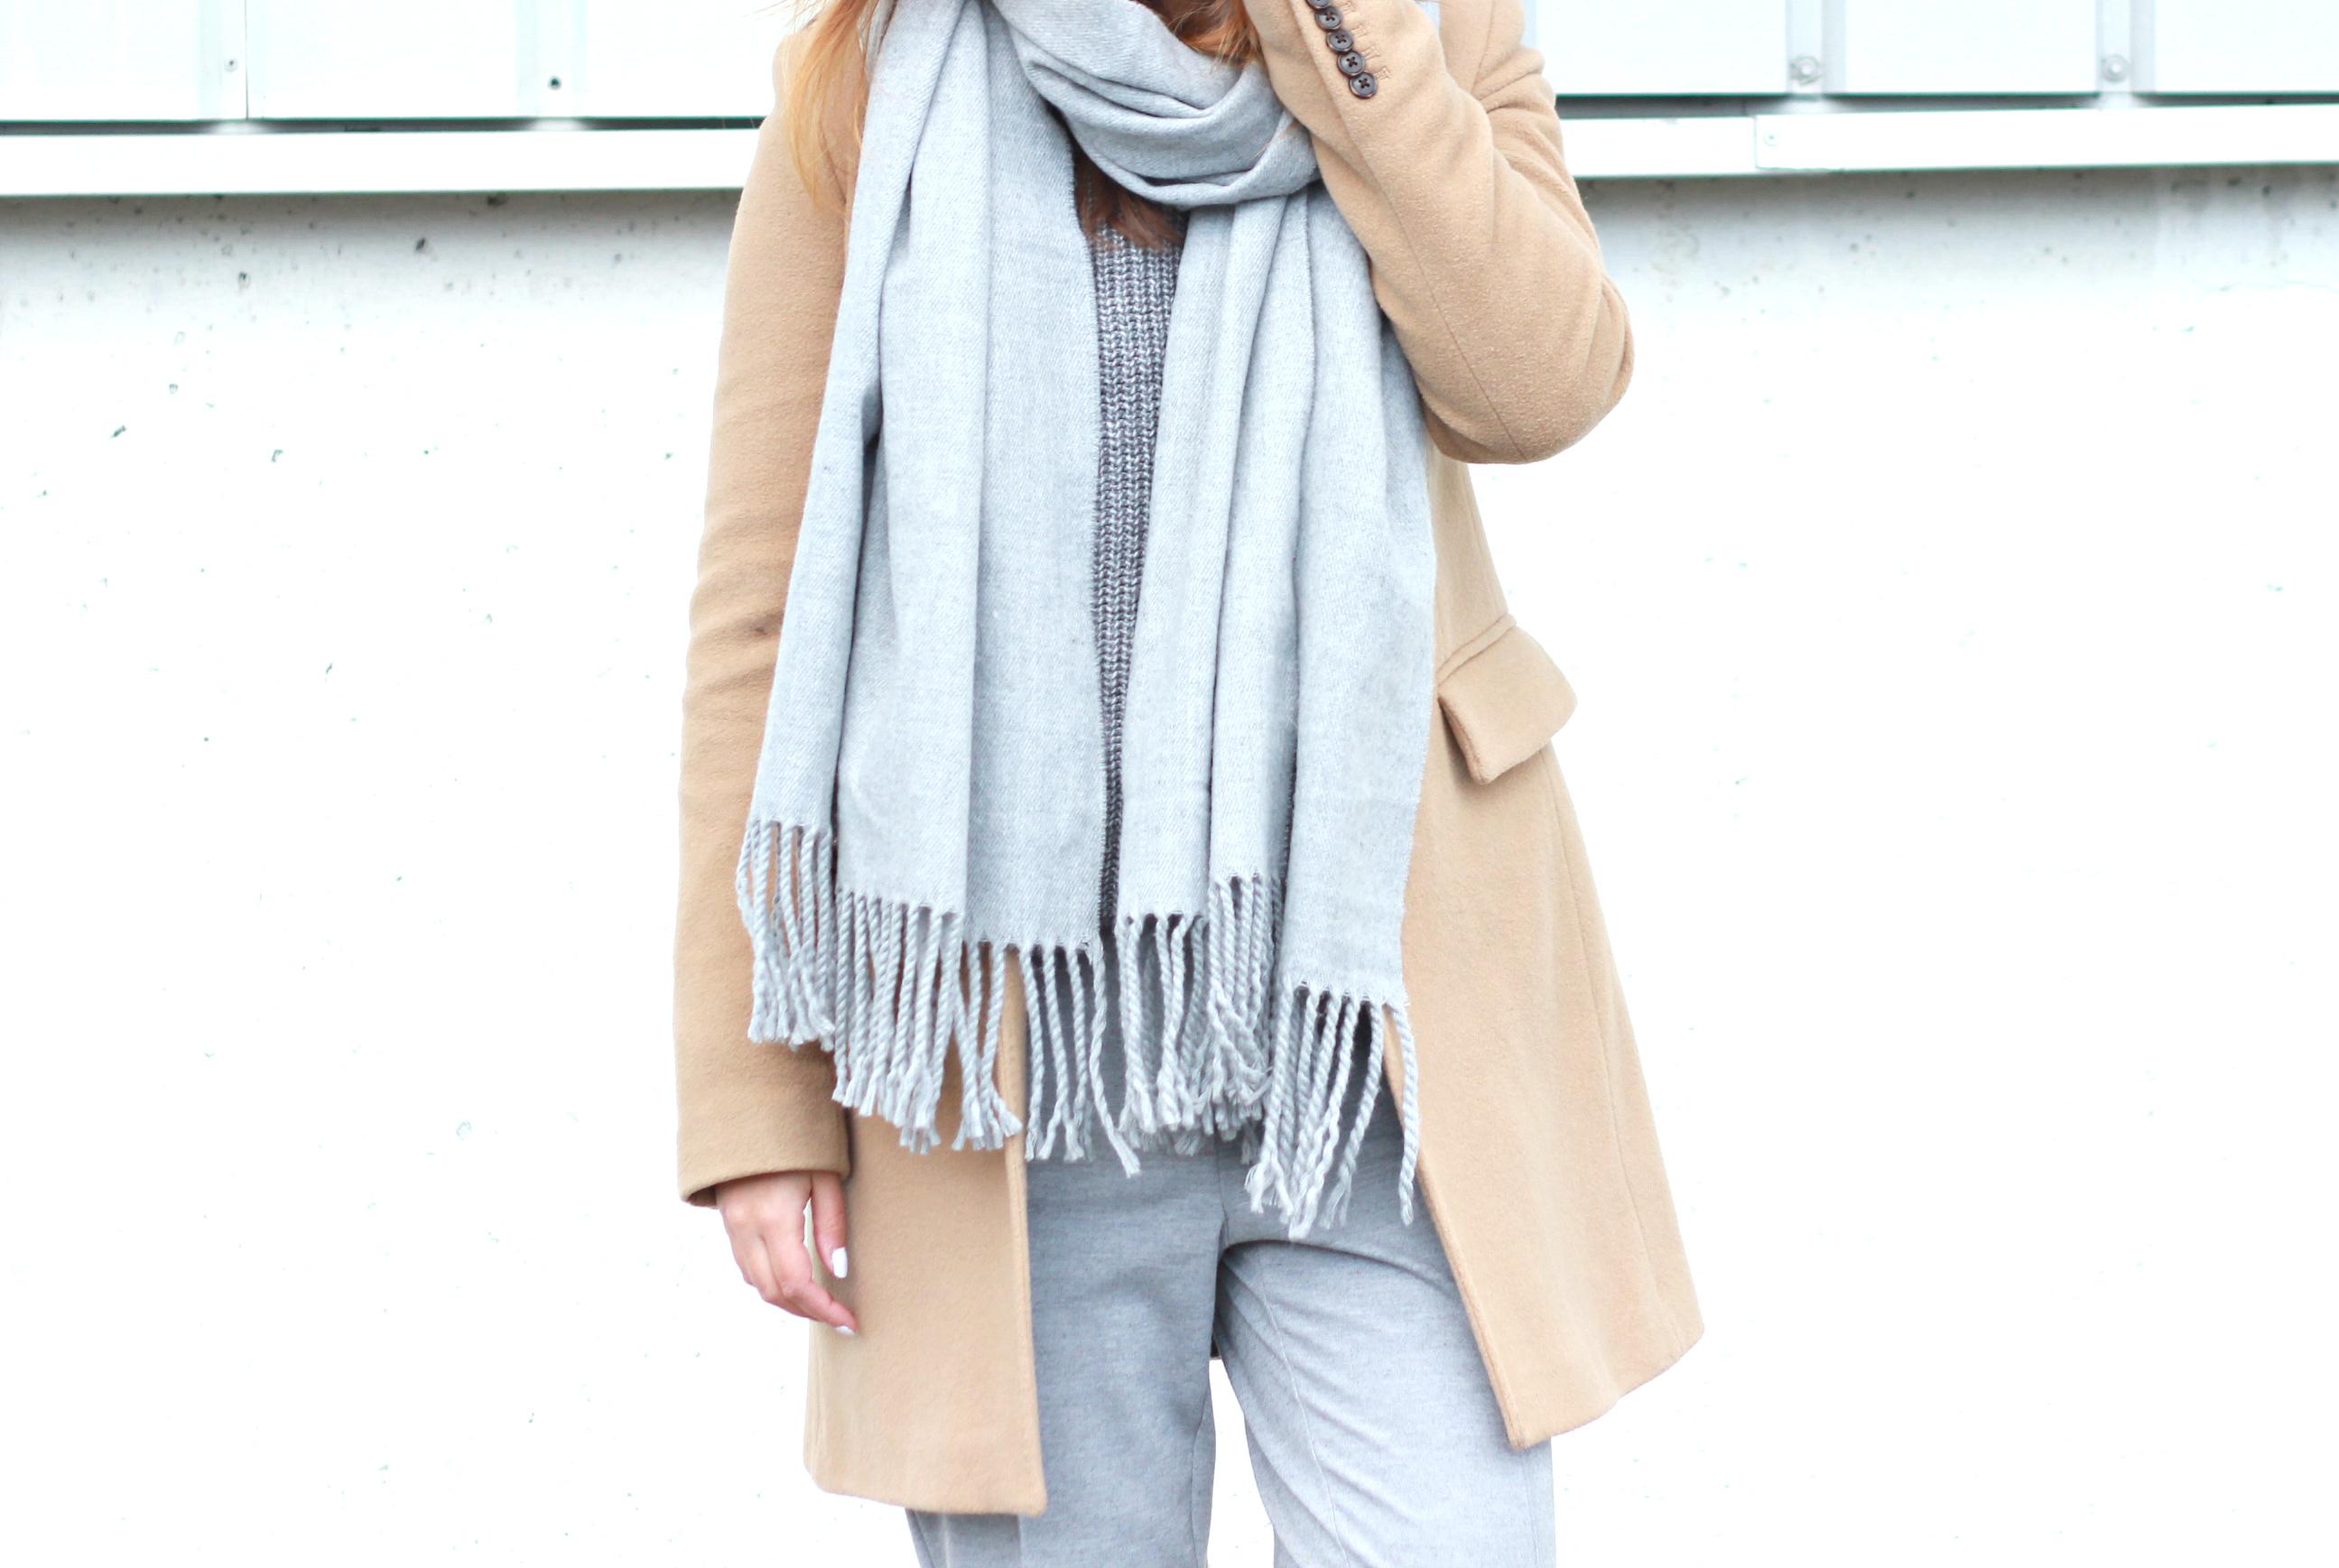 Camel-coat-grey-knitwear-street-style-inspiration